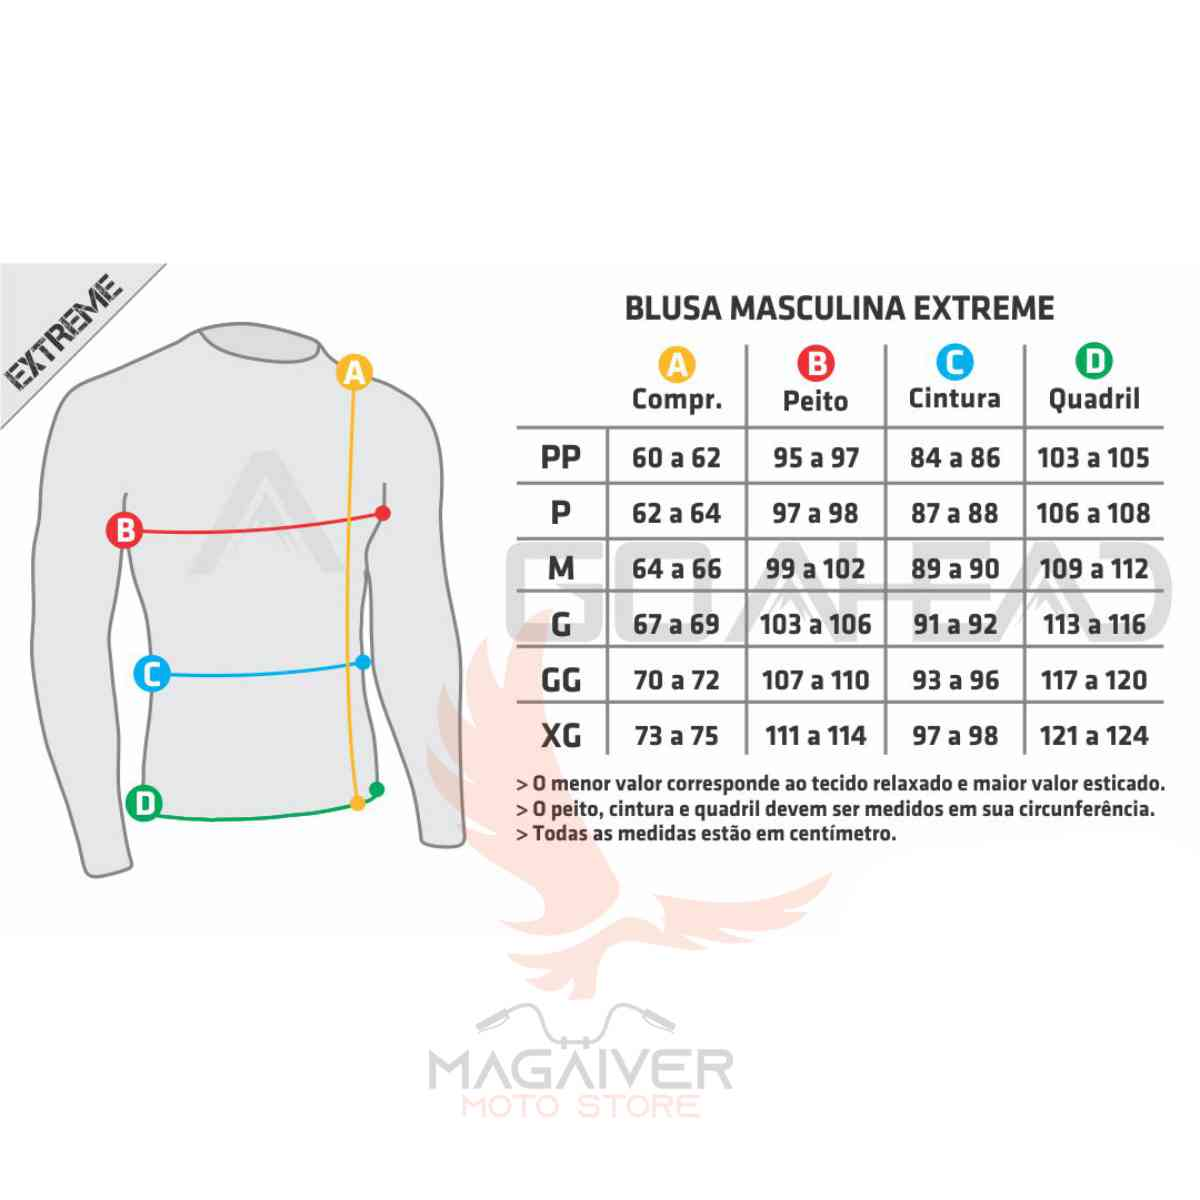 BLUSA GO AHEAD JACKET MASCULINO SEGUNDA PELE C/ ZÍPER INTEIRO EXTREME